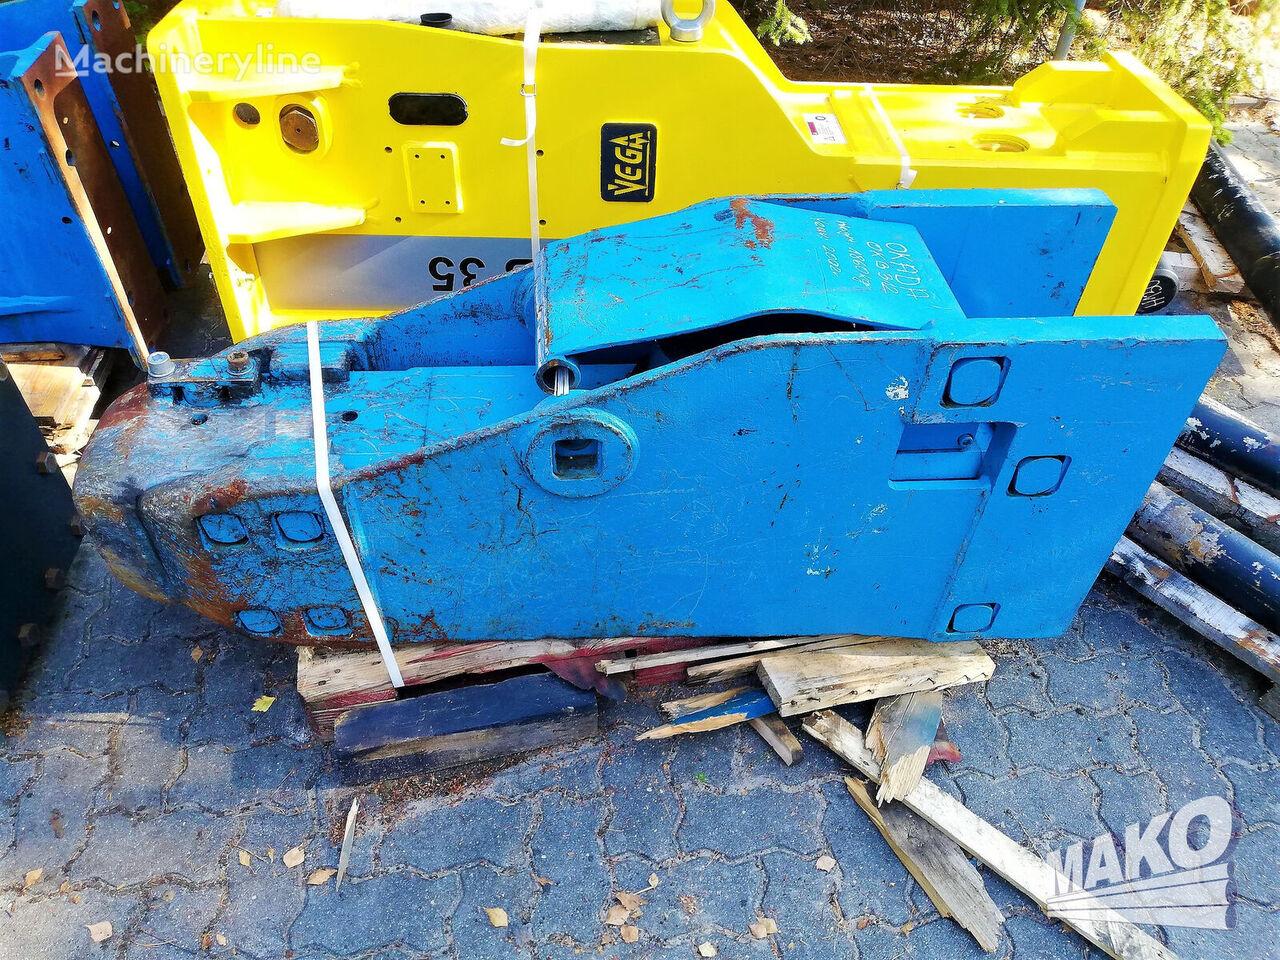 OKADA OKB 312 hydraulic breaker